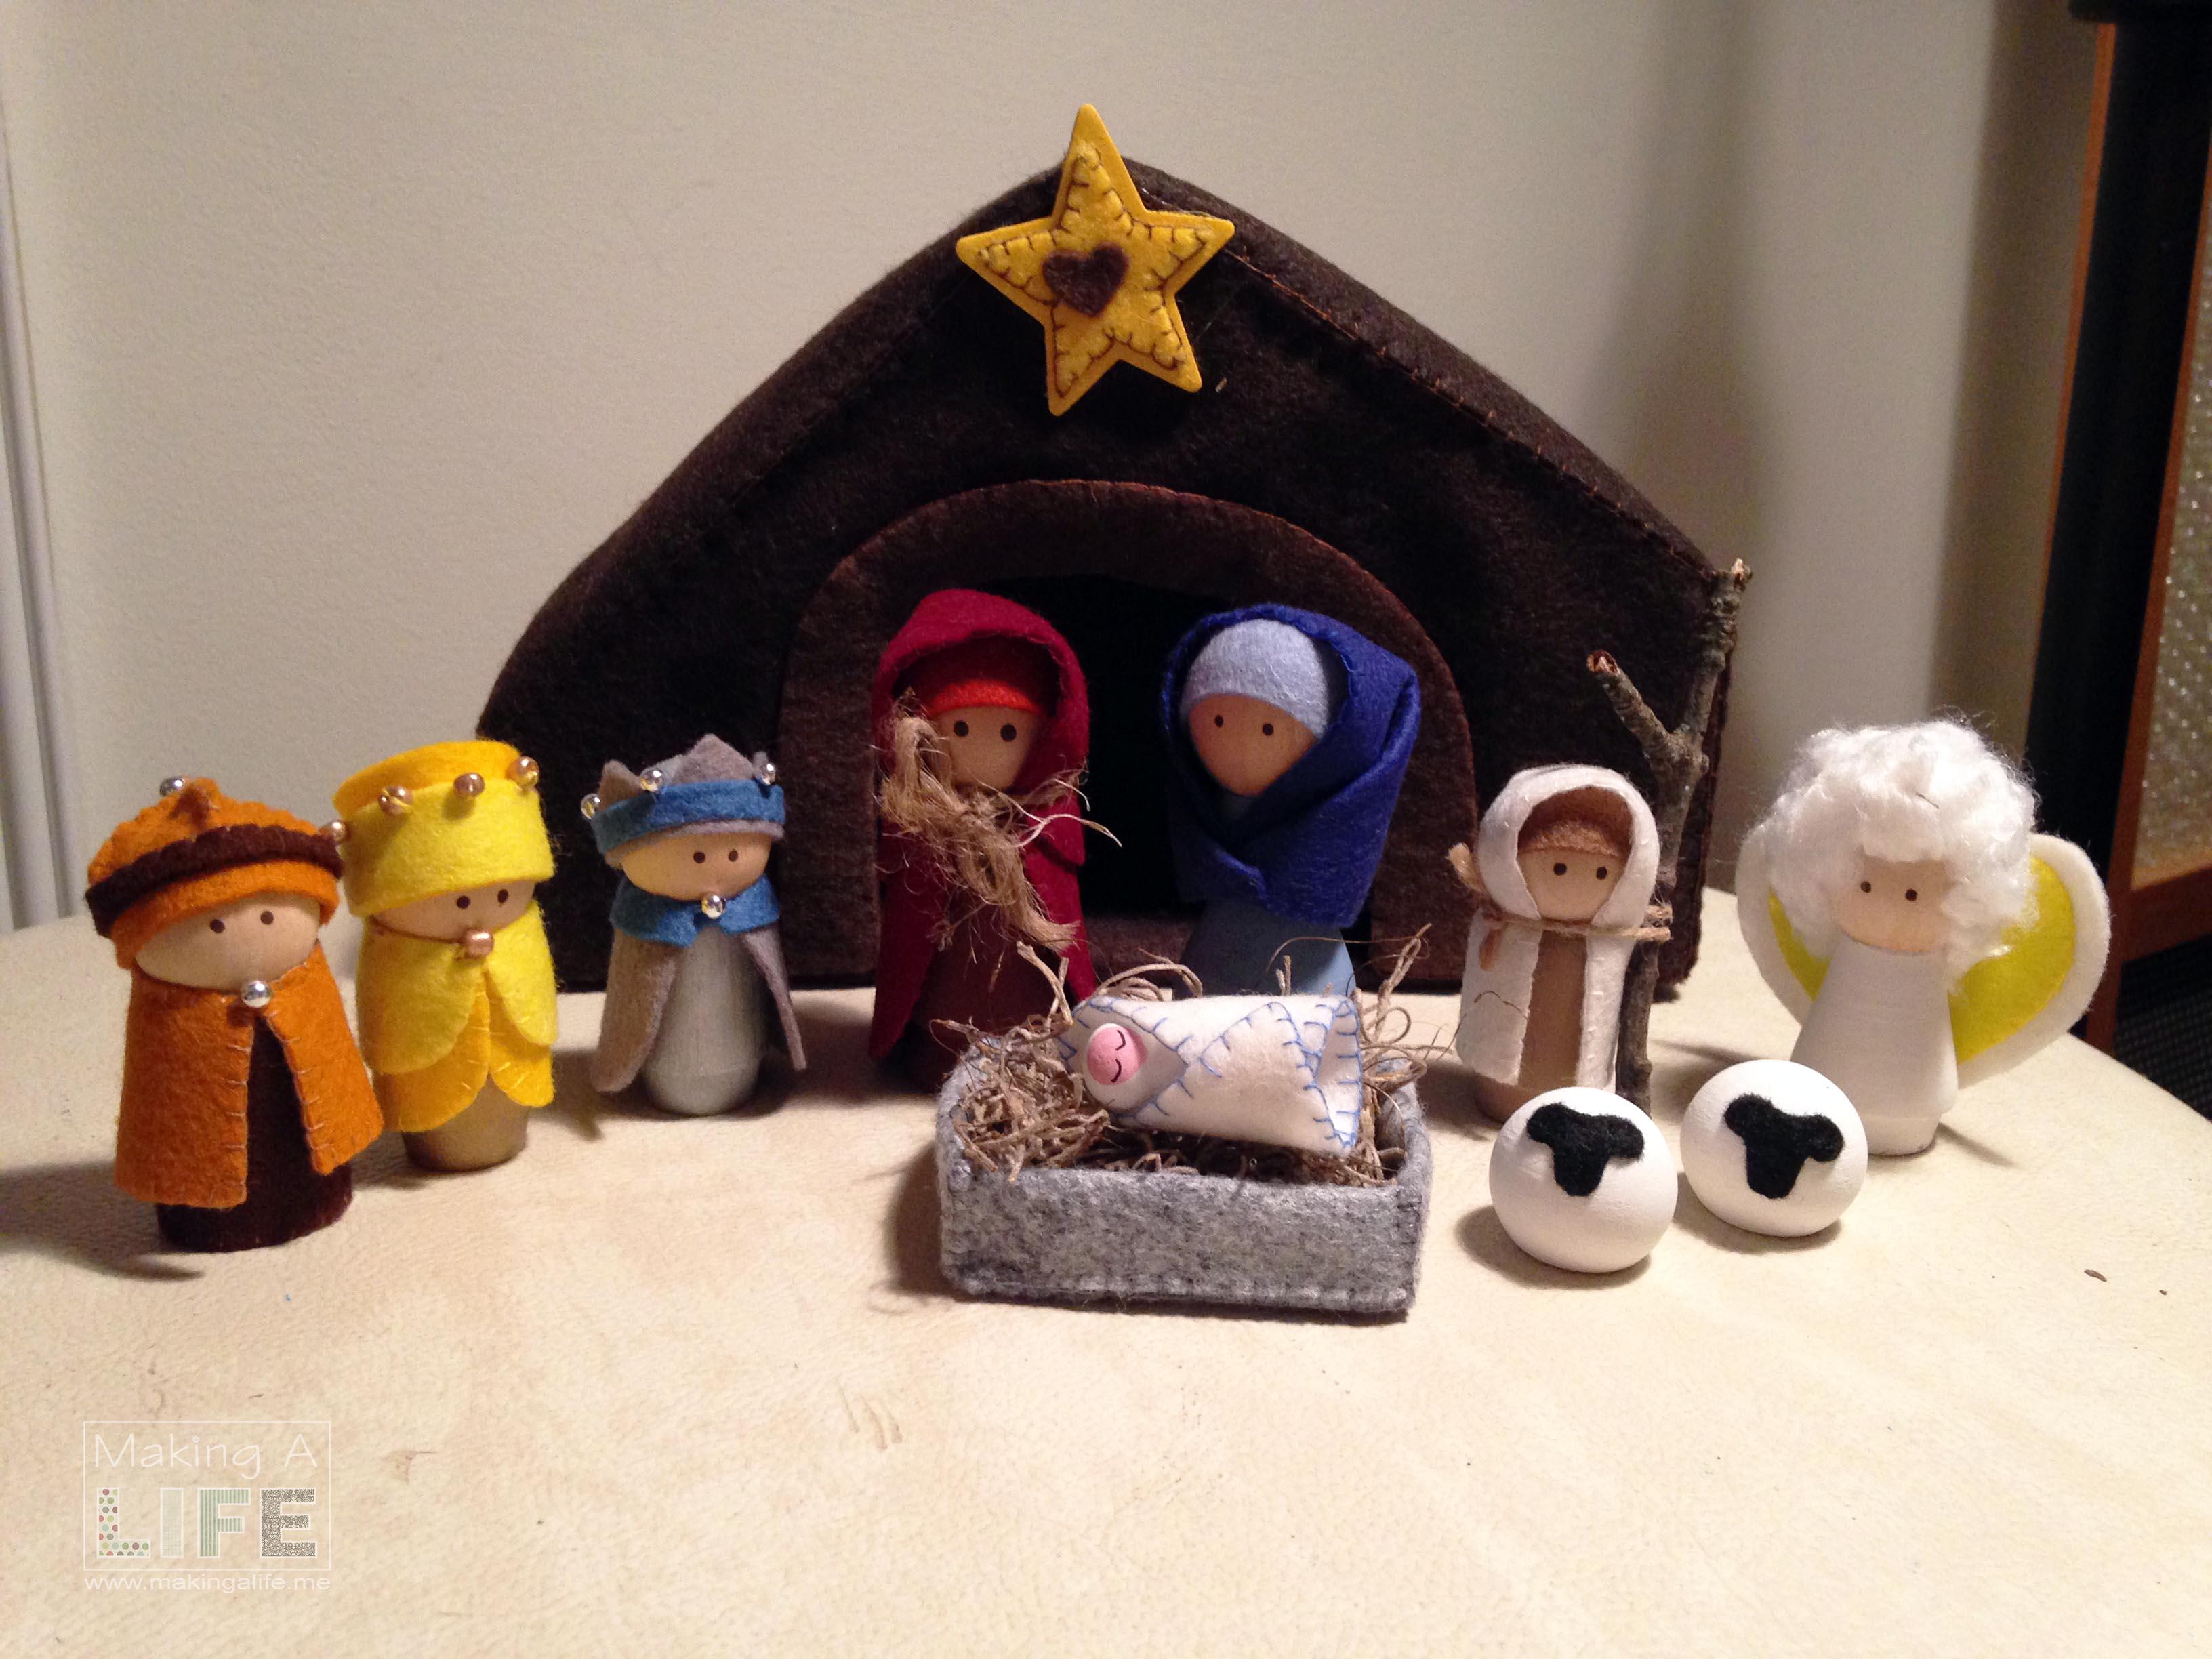 Nativity_Making A Life